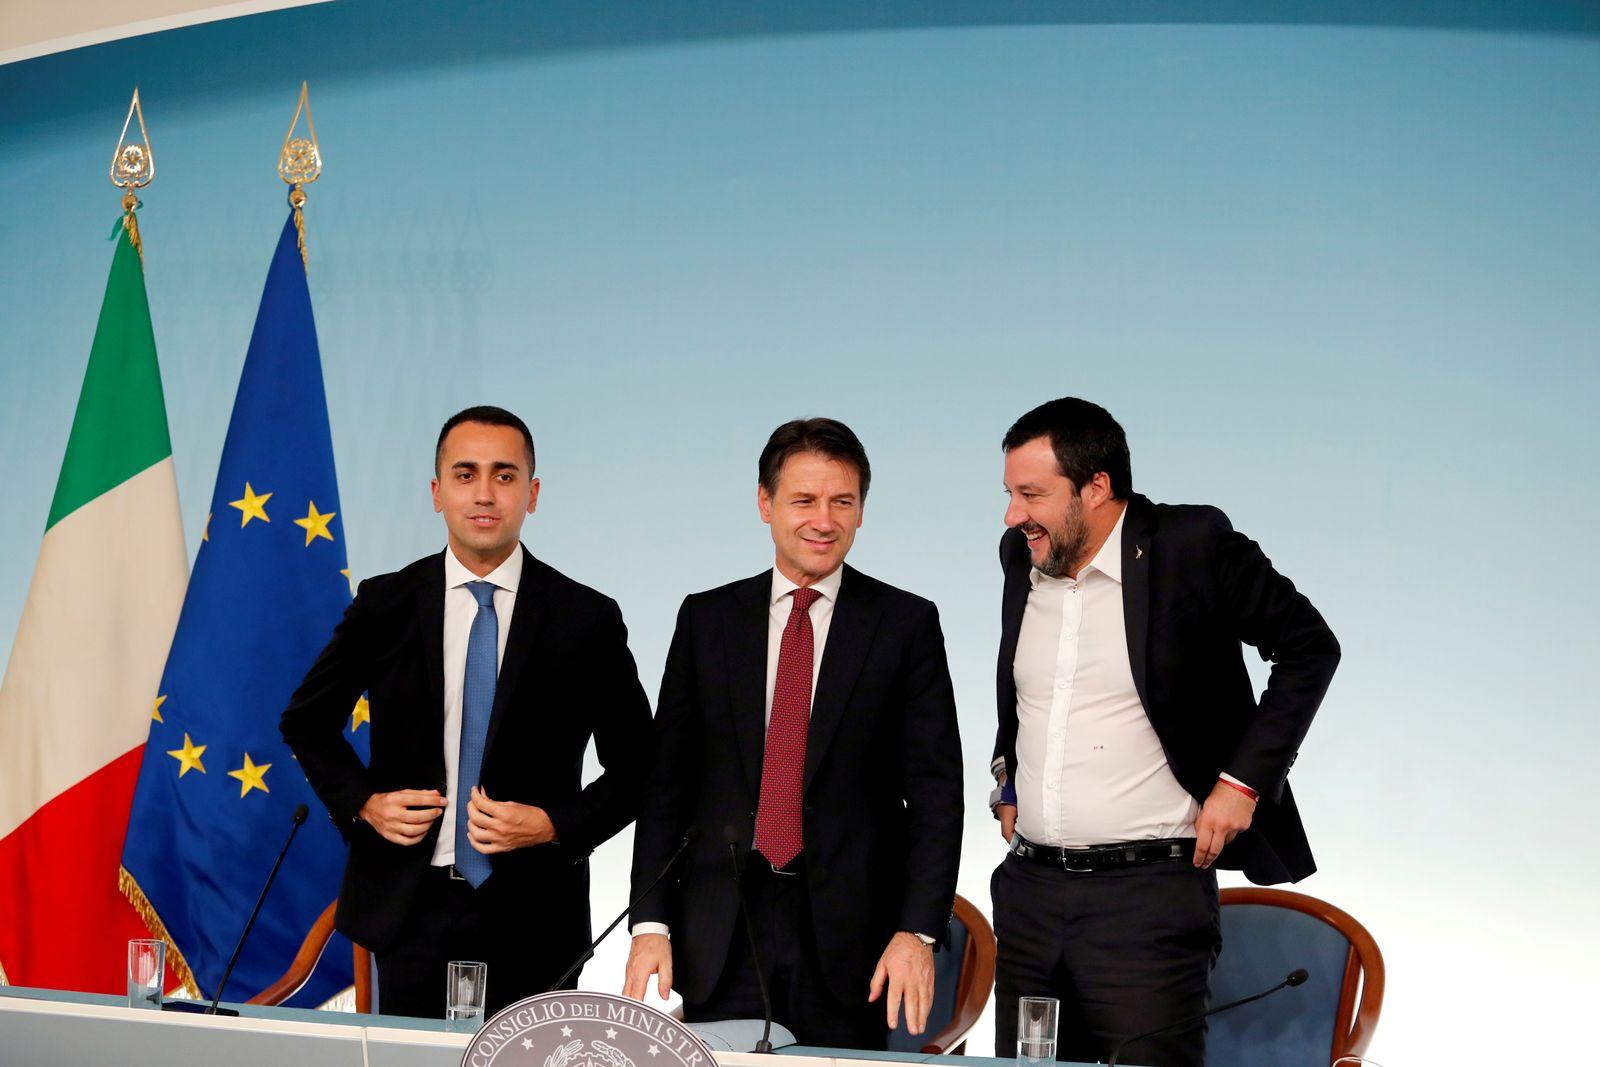 Luigi Di Maio Giuseppe ConteMatteo Salvini